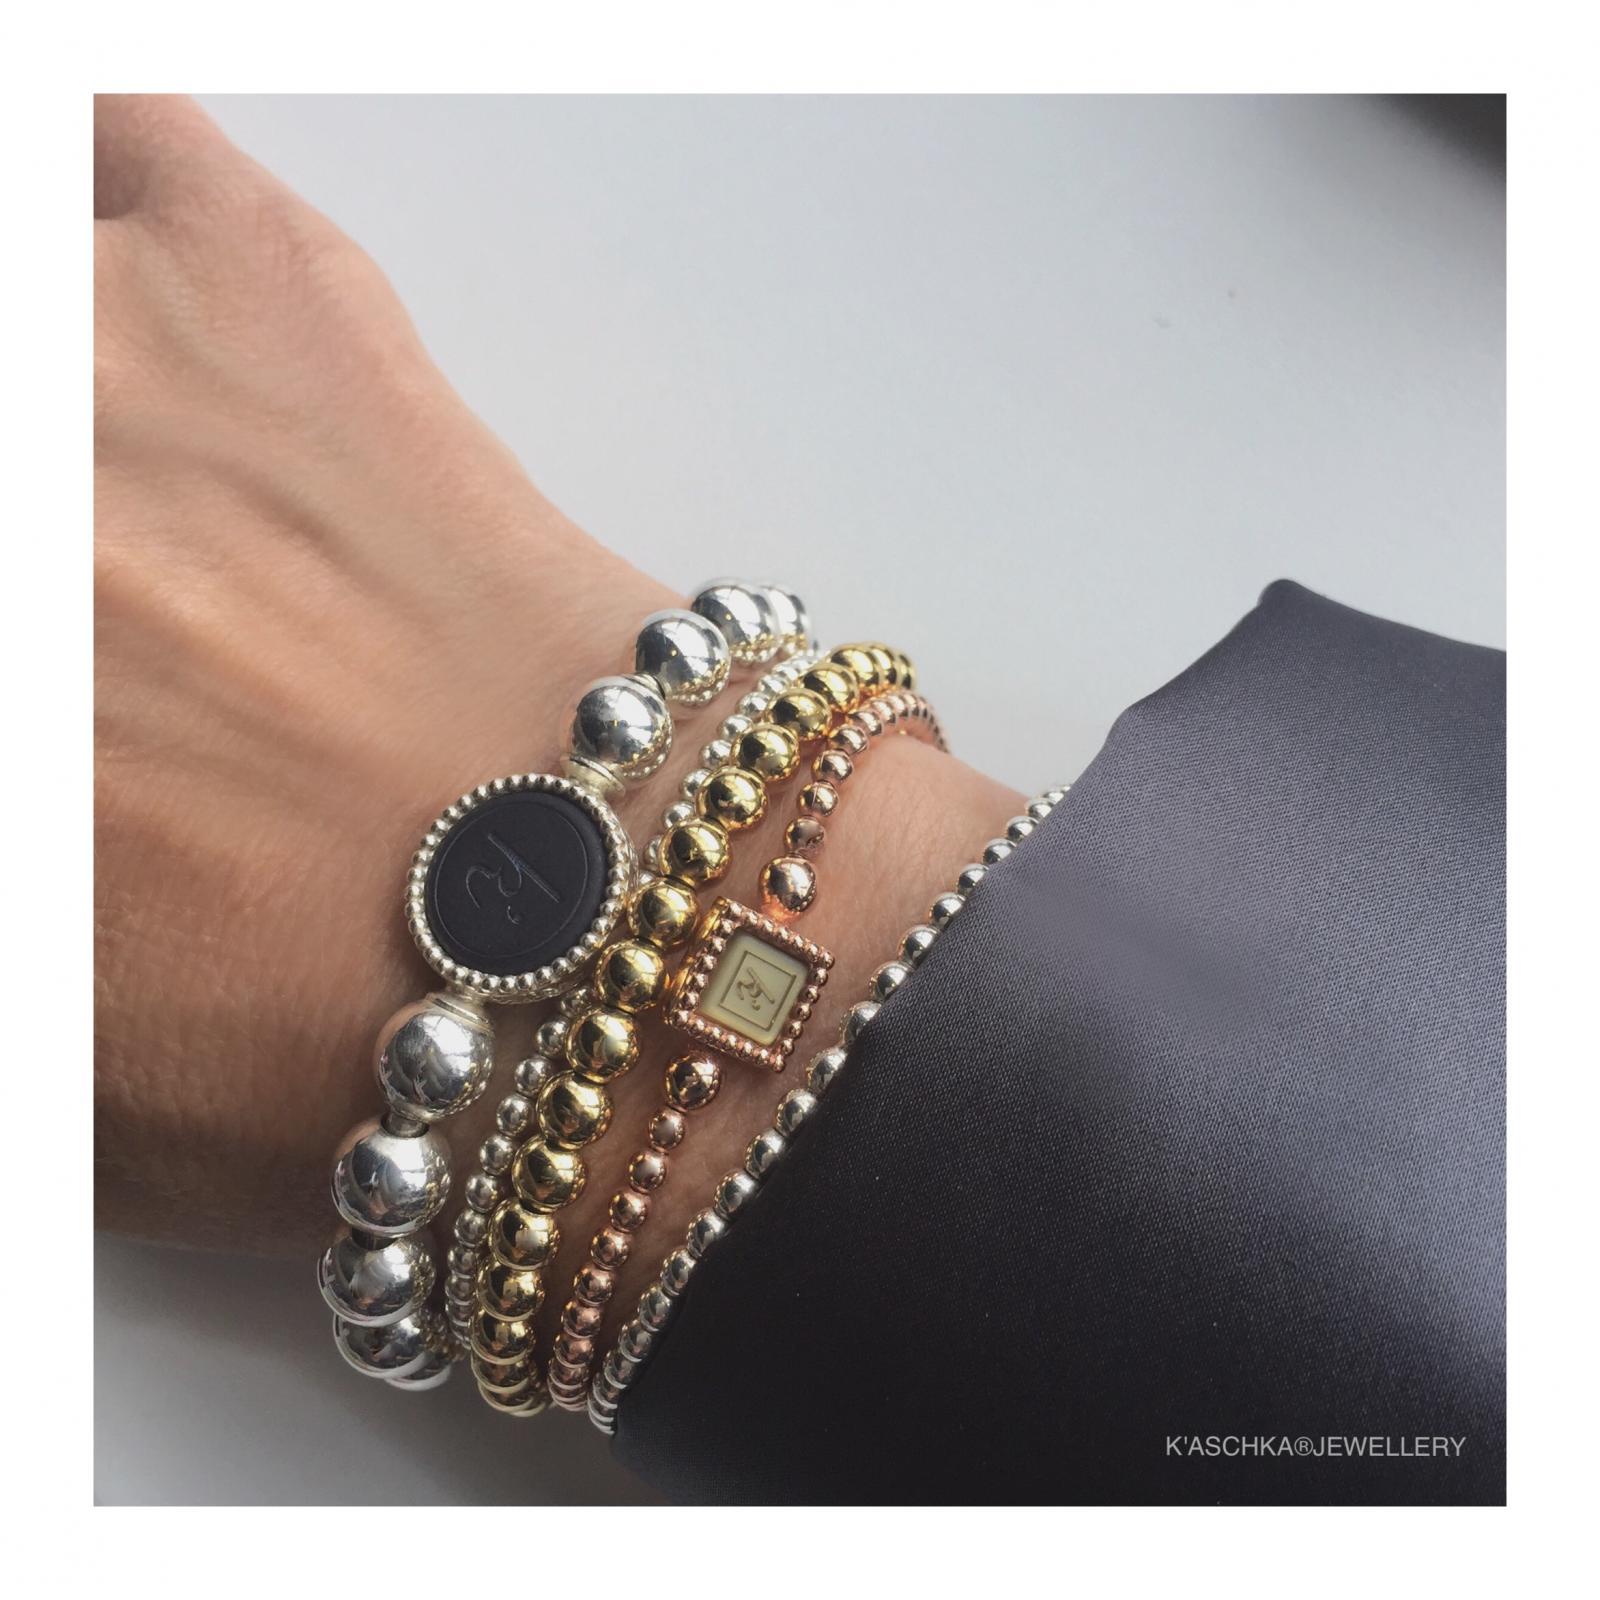 Flexibele 925 sterling zilveren wisselbare armband deluxe Flexibele 925 sterling zilveren armband kasminis